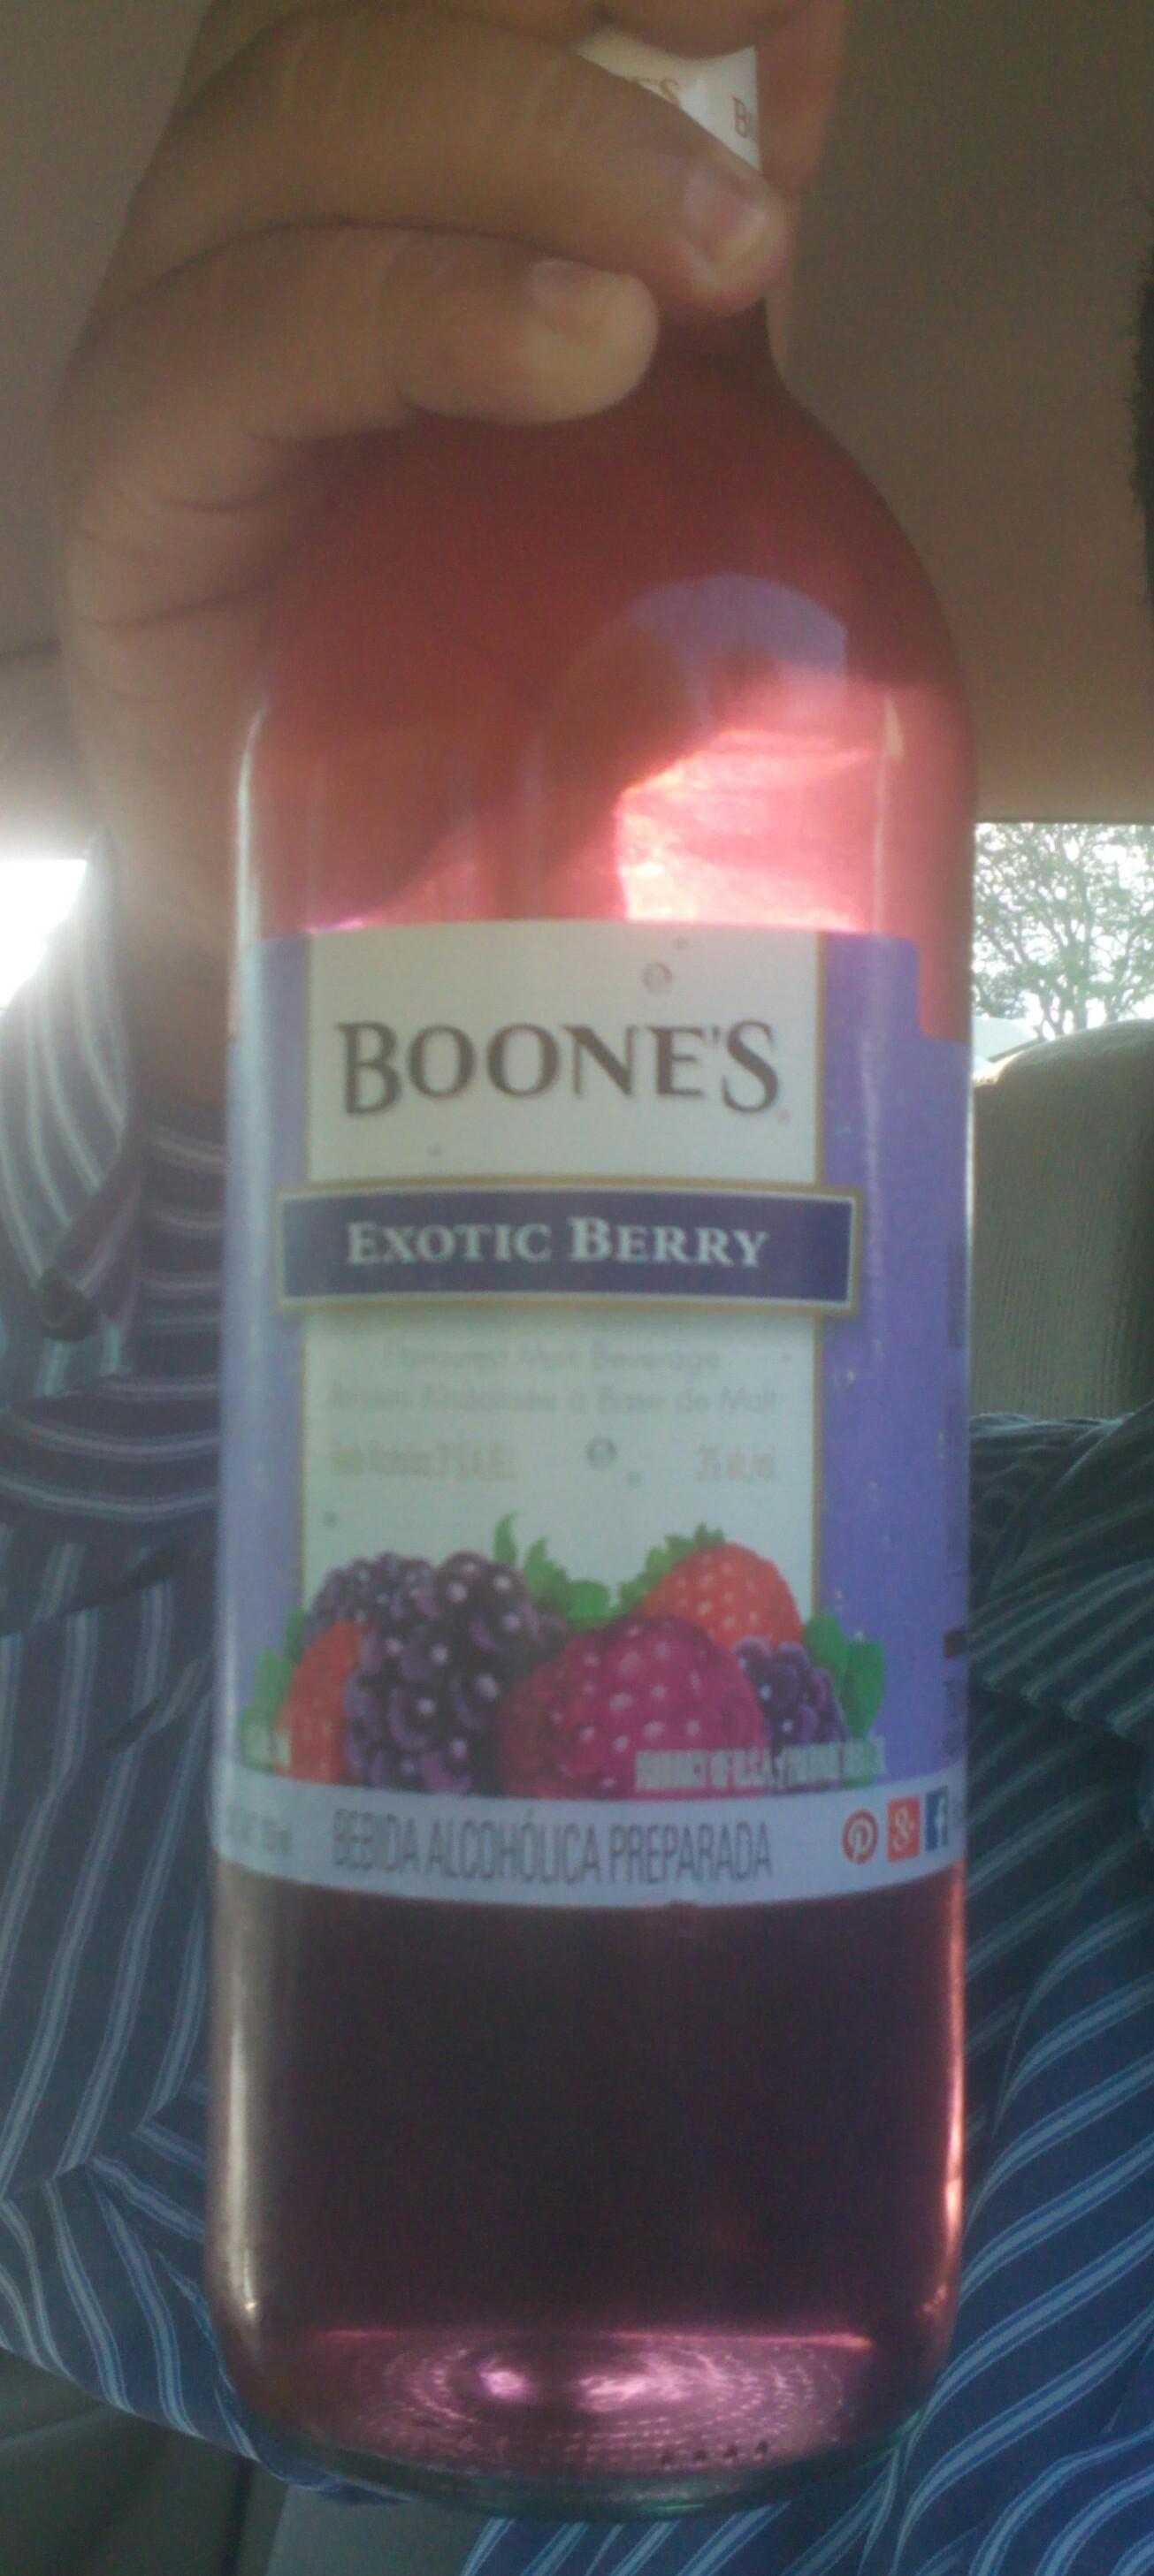 Bodega Aurrera: bones exotic berrys a $16.02